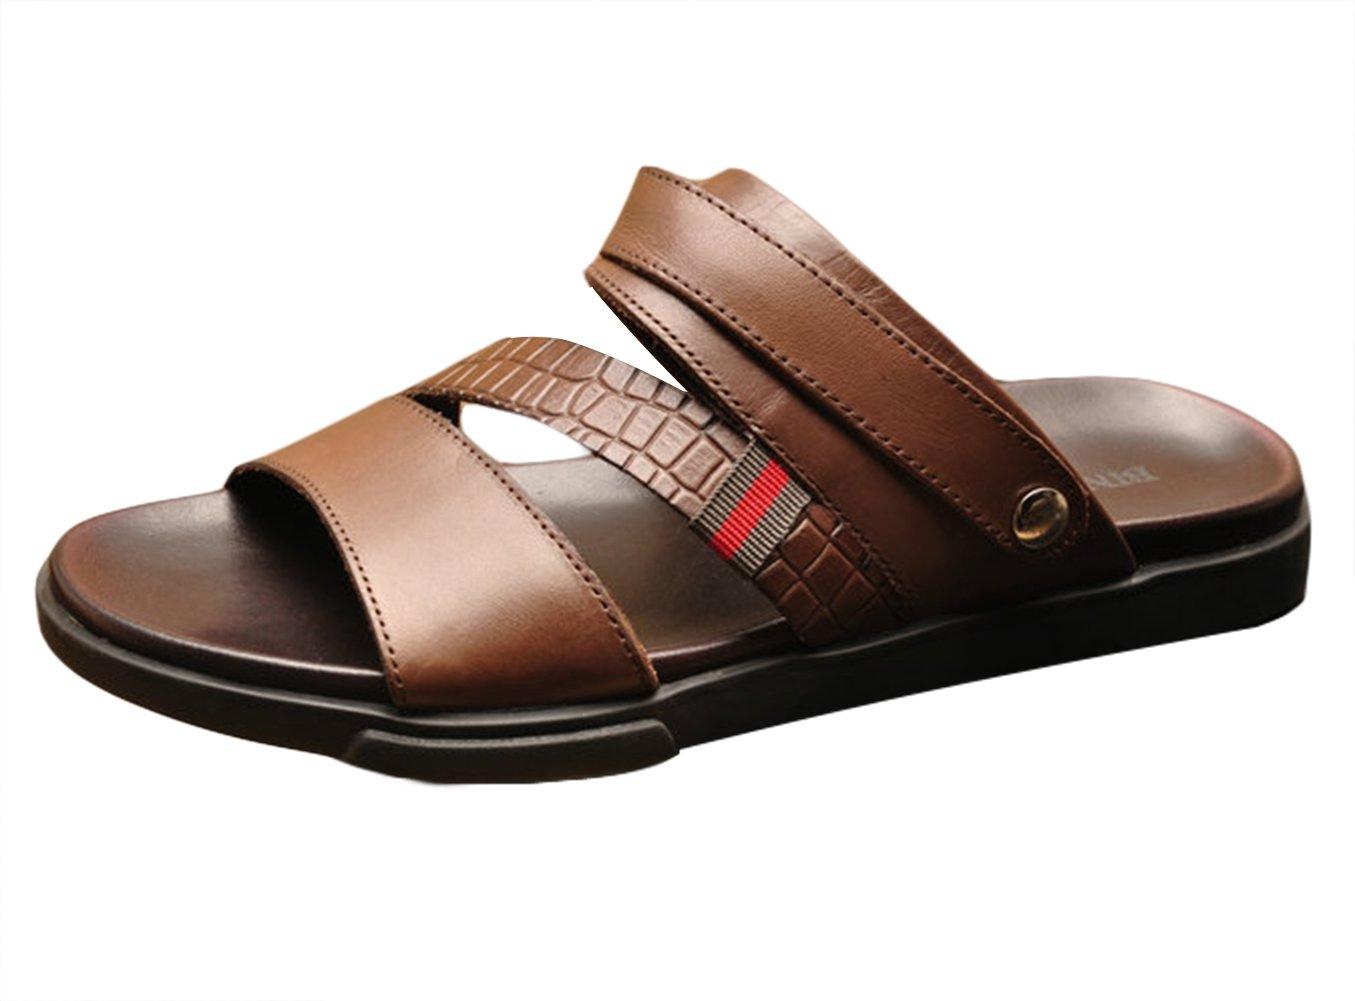 ICEGREY - Sandalias de Vestir de Caucho para Hombre 42 EU|Braun-19984